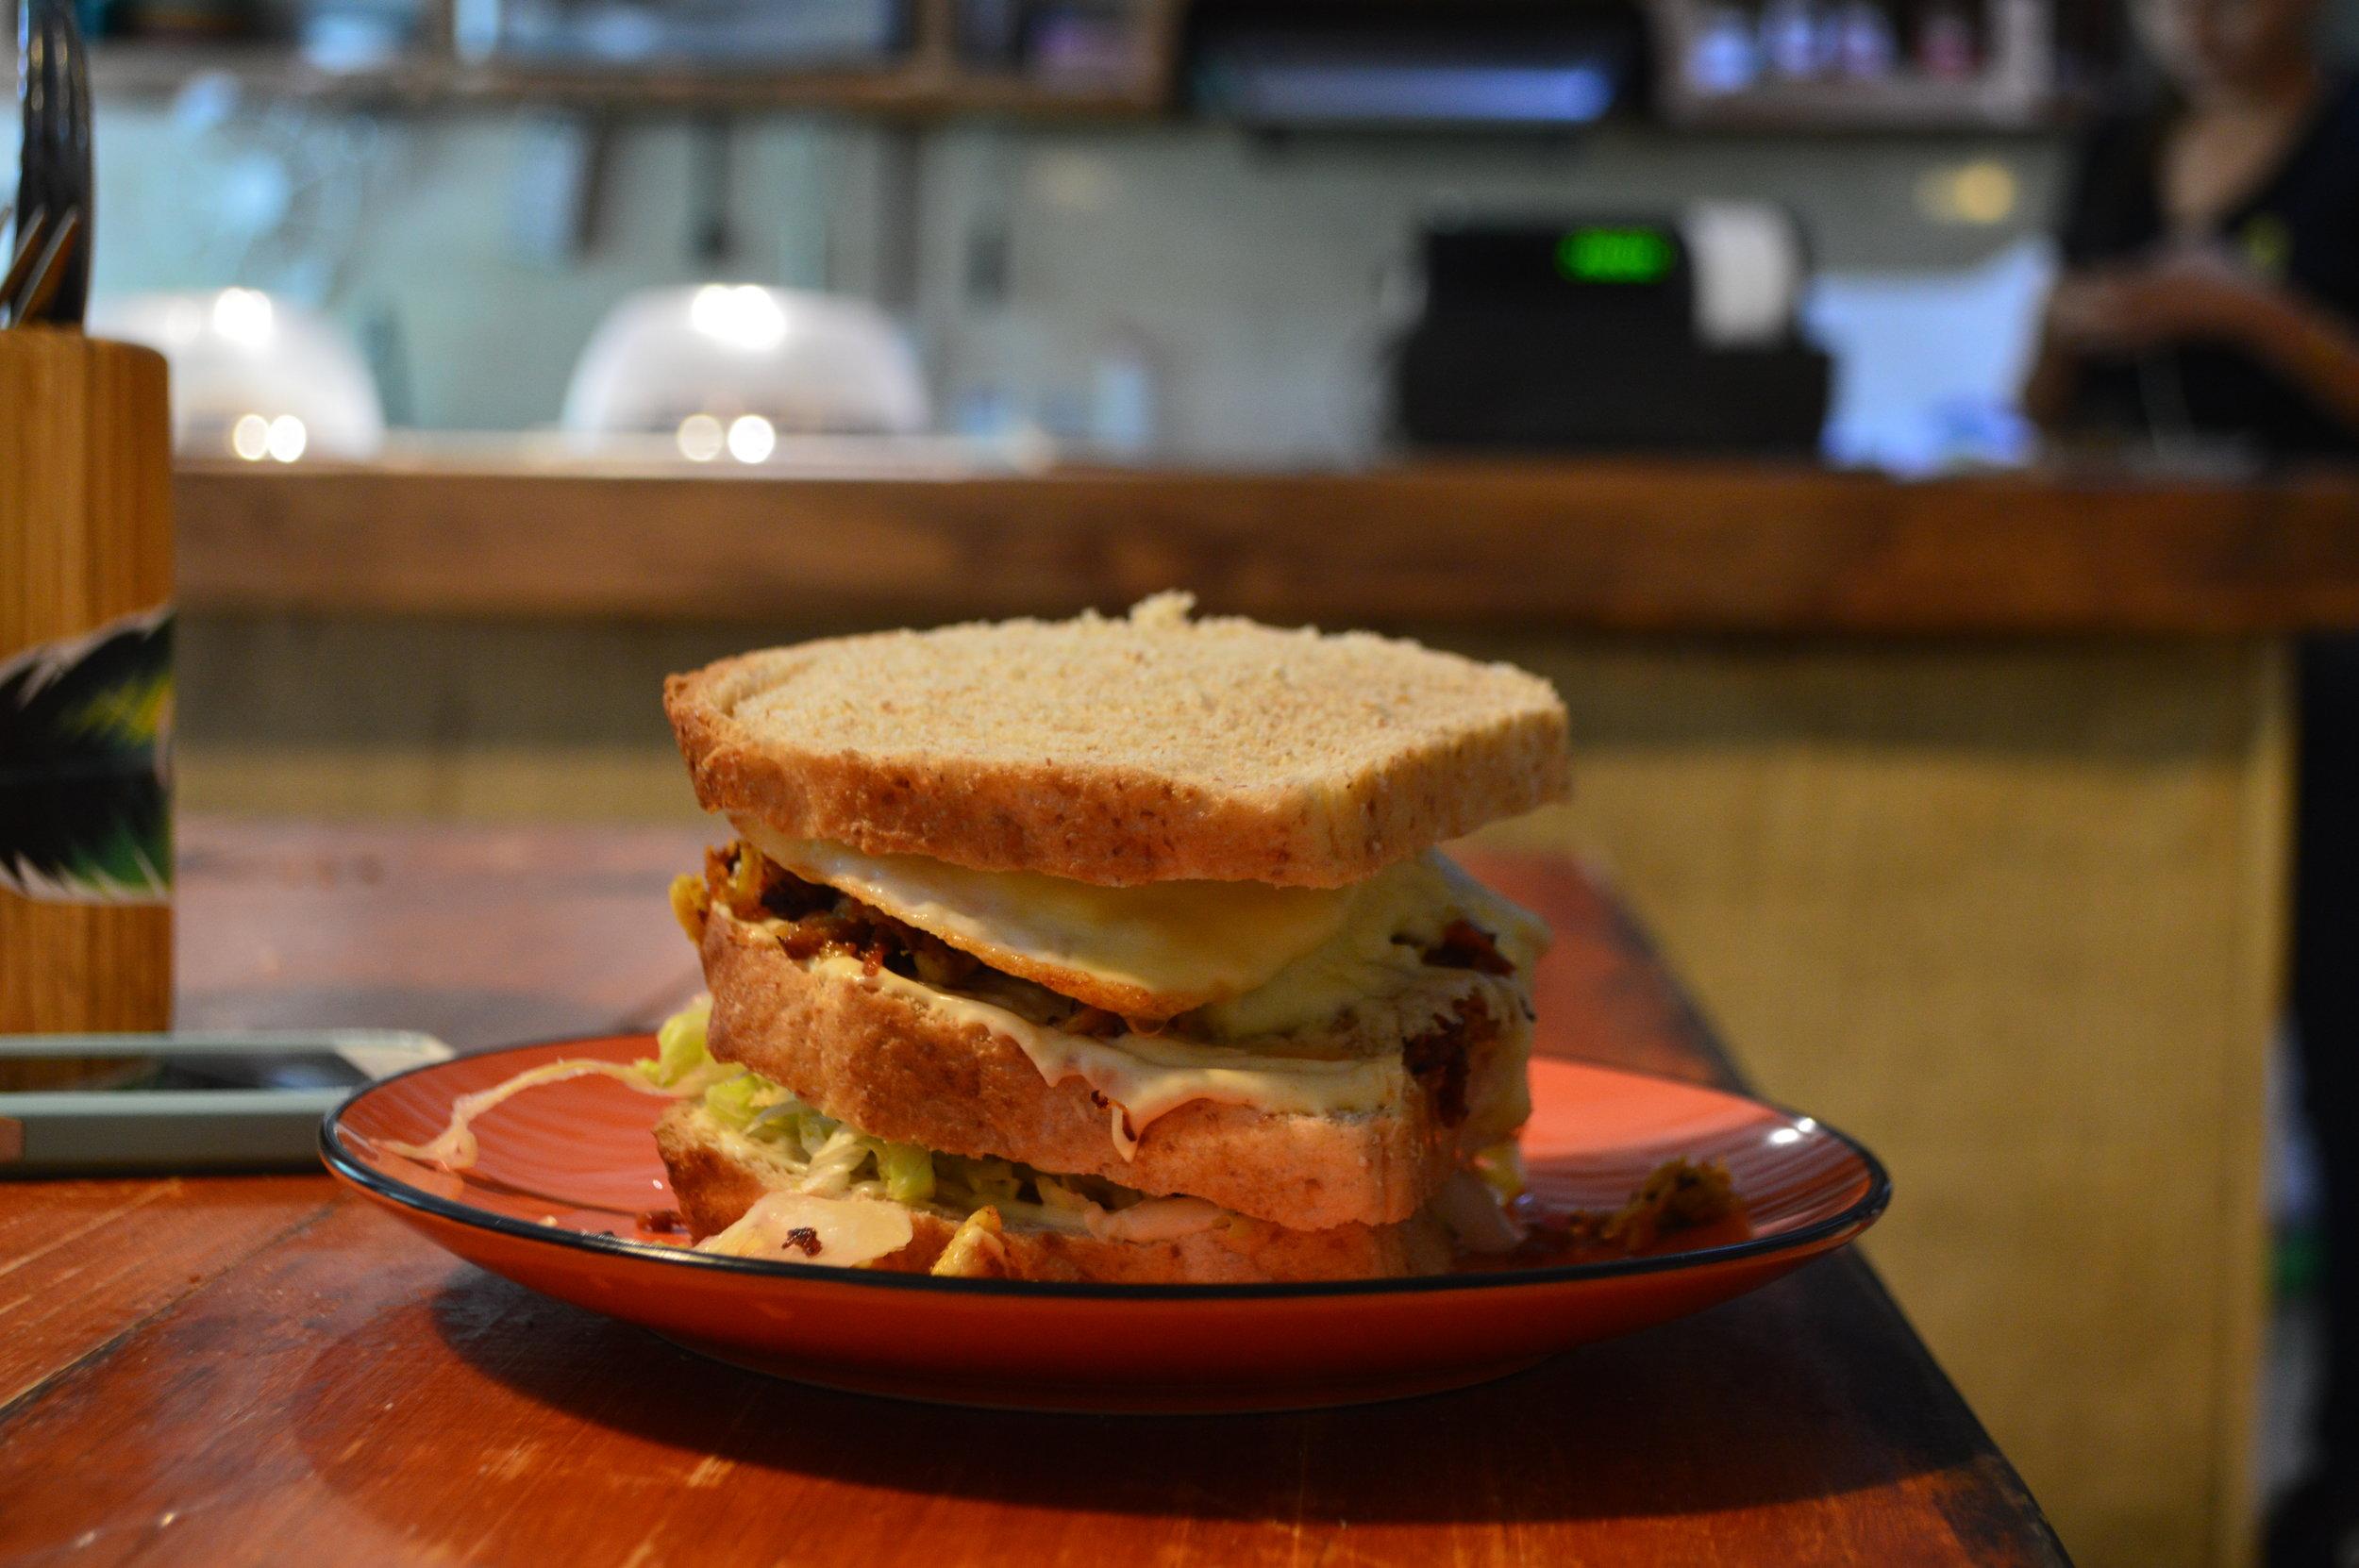 Club sandwich at Finca La Victoria. Great stop for lunch!